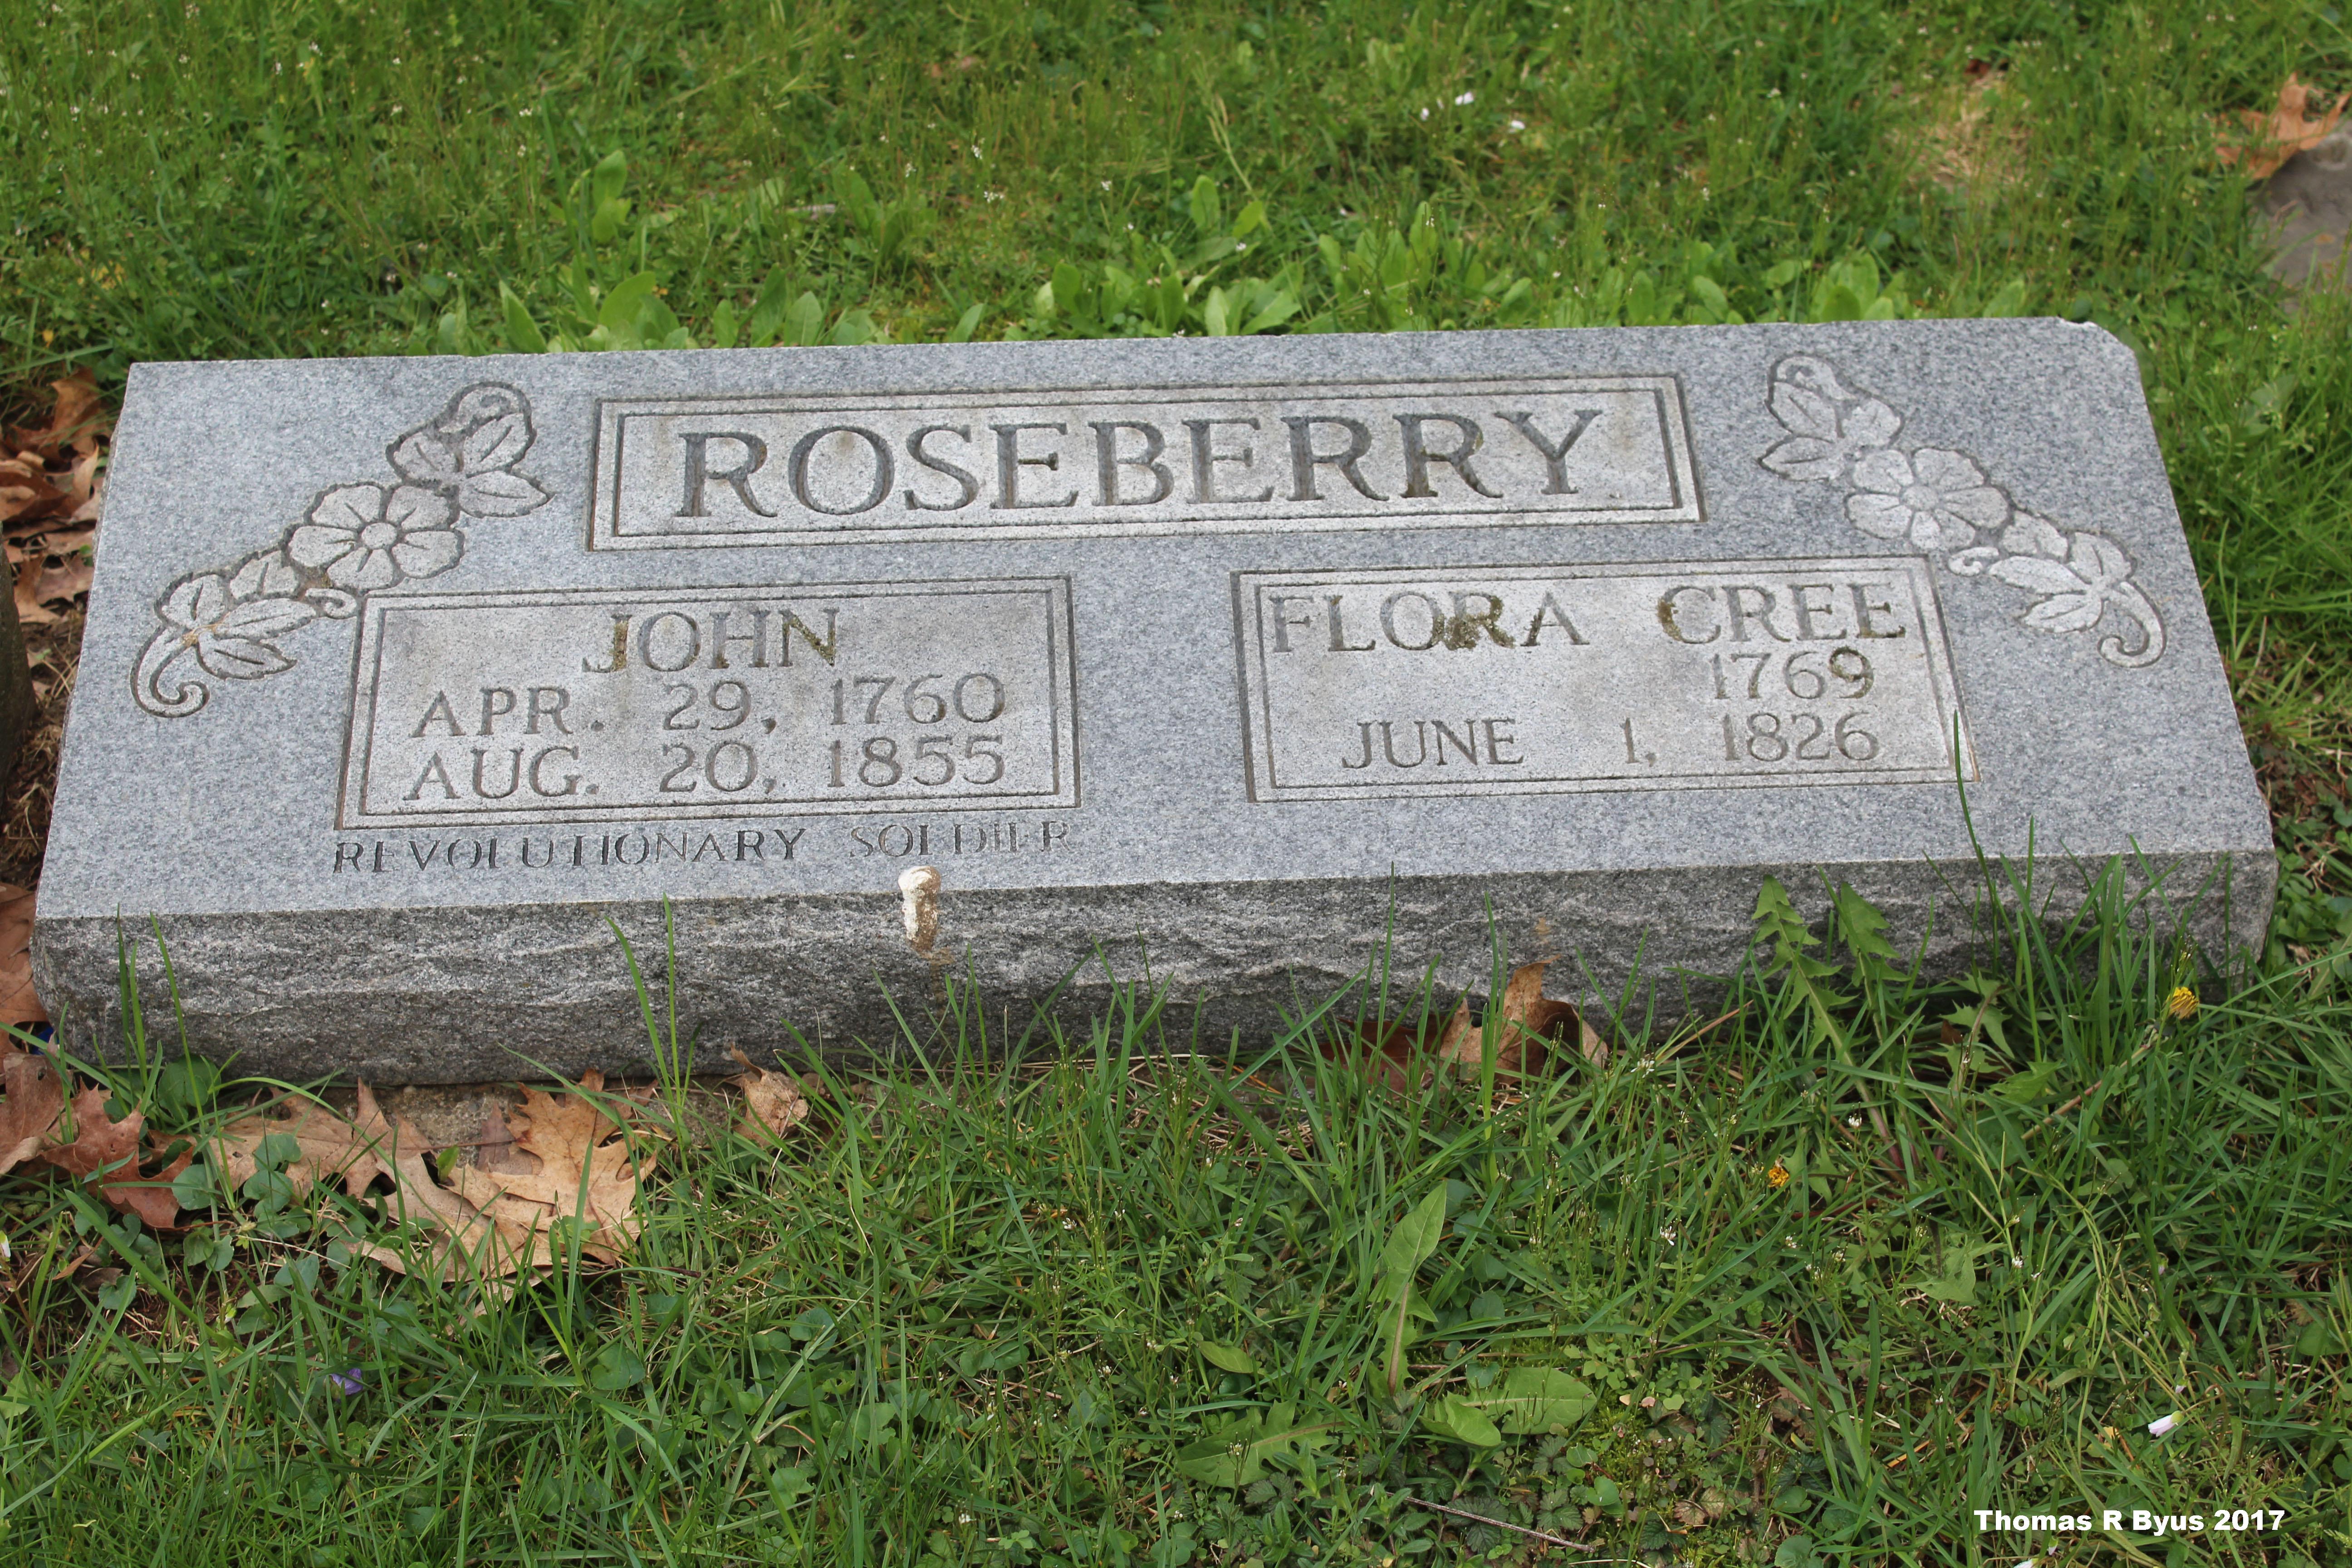 John Roseberry's updated grave marker at Pioneer Cemetery.